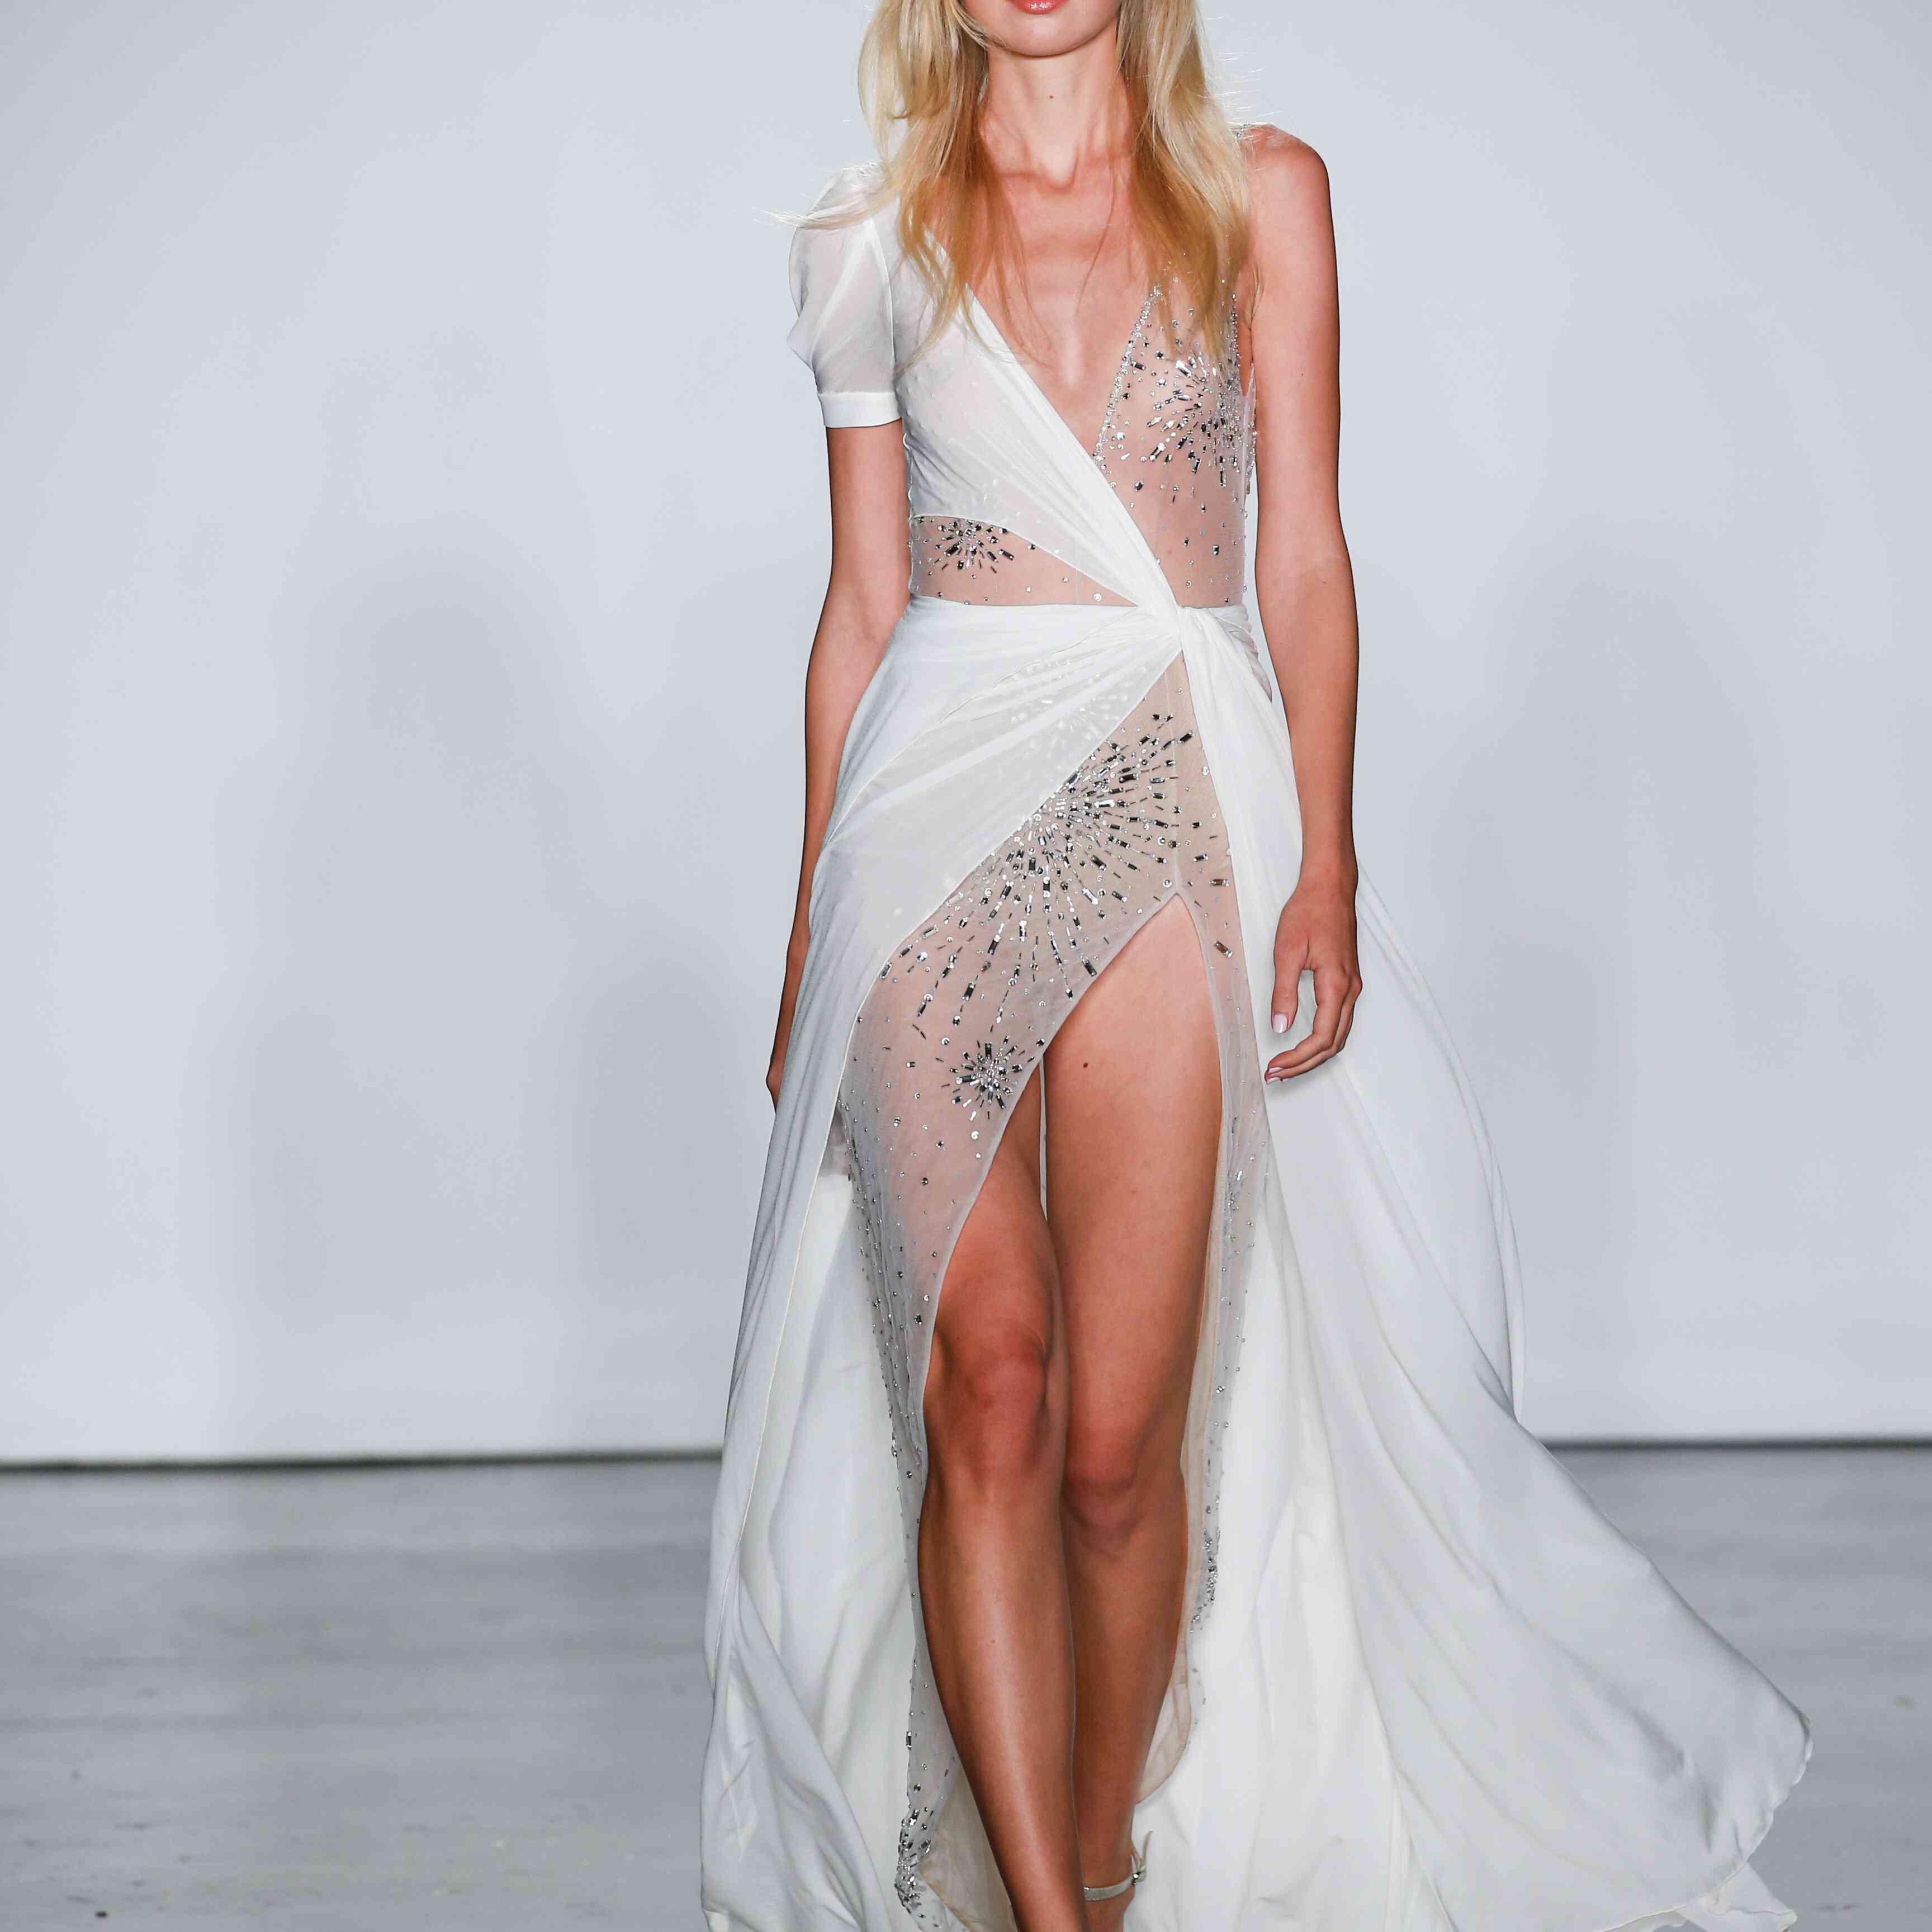 Model in asymmetric wedding dress with slit